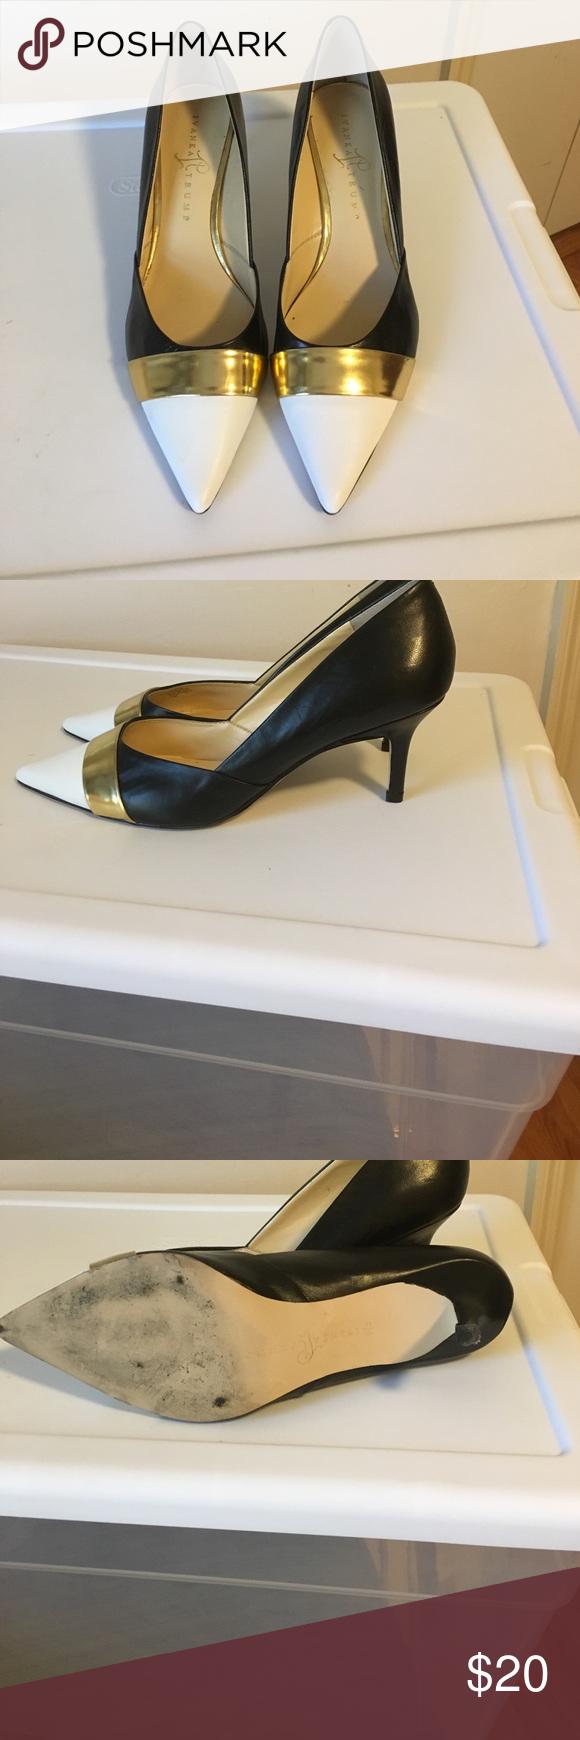 Shoes - by Ivanka Trump Ivanka Trump heels. Nice low heel. Black and white